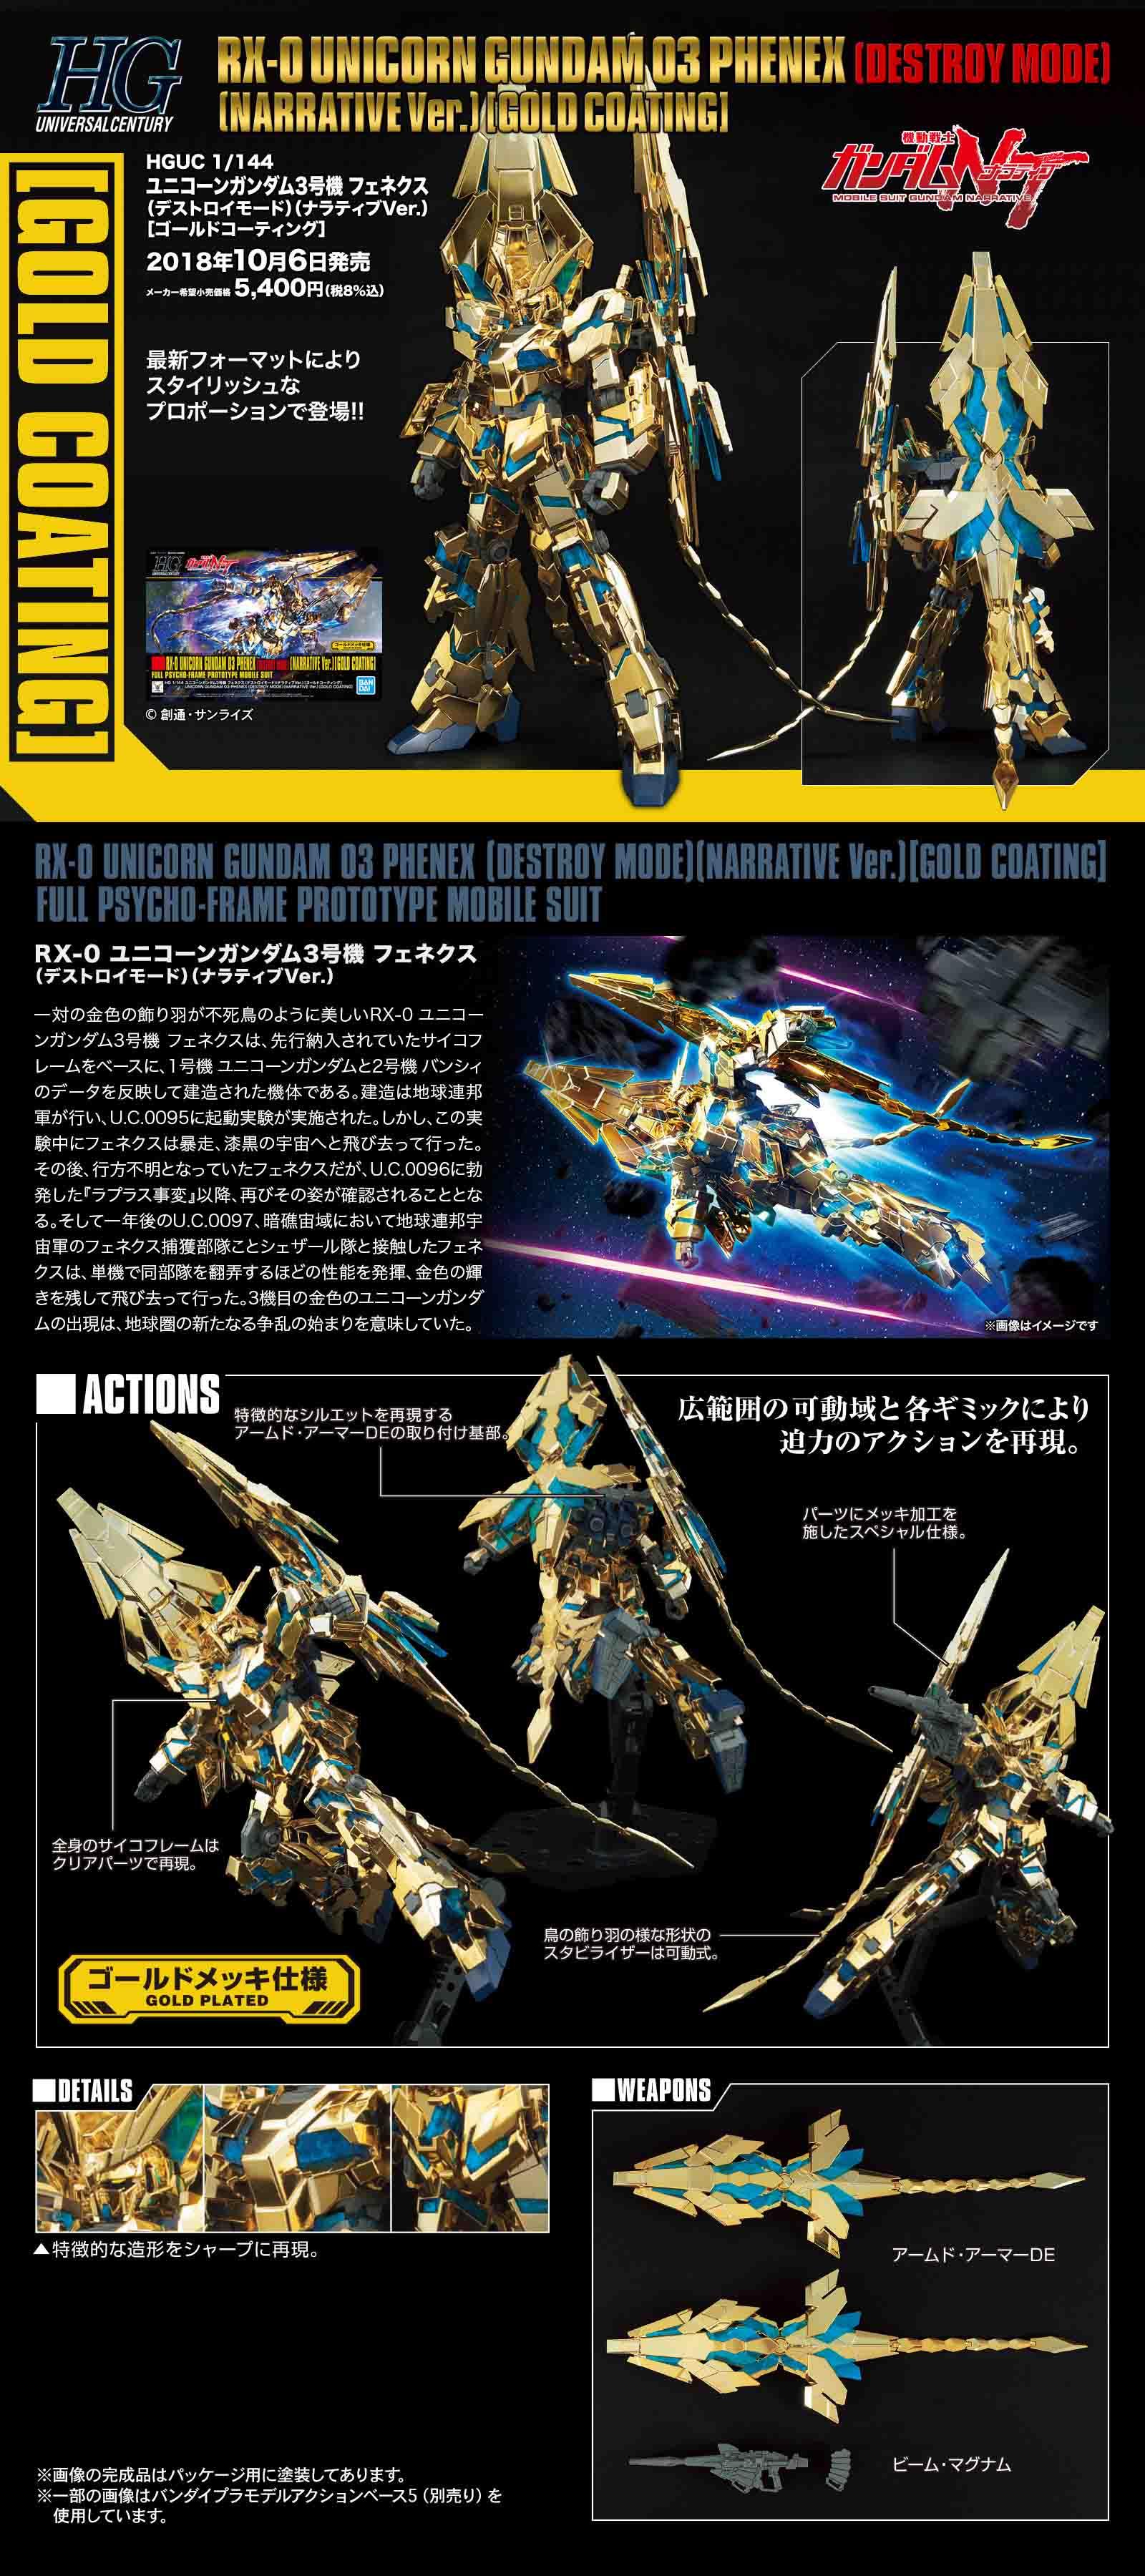 HGUC #217 1/144 獨角獸鋼彈3號機 鳳凰[金色電鍍],官方宣傳圖。